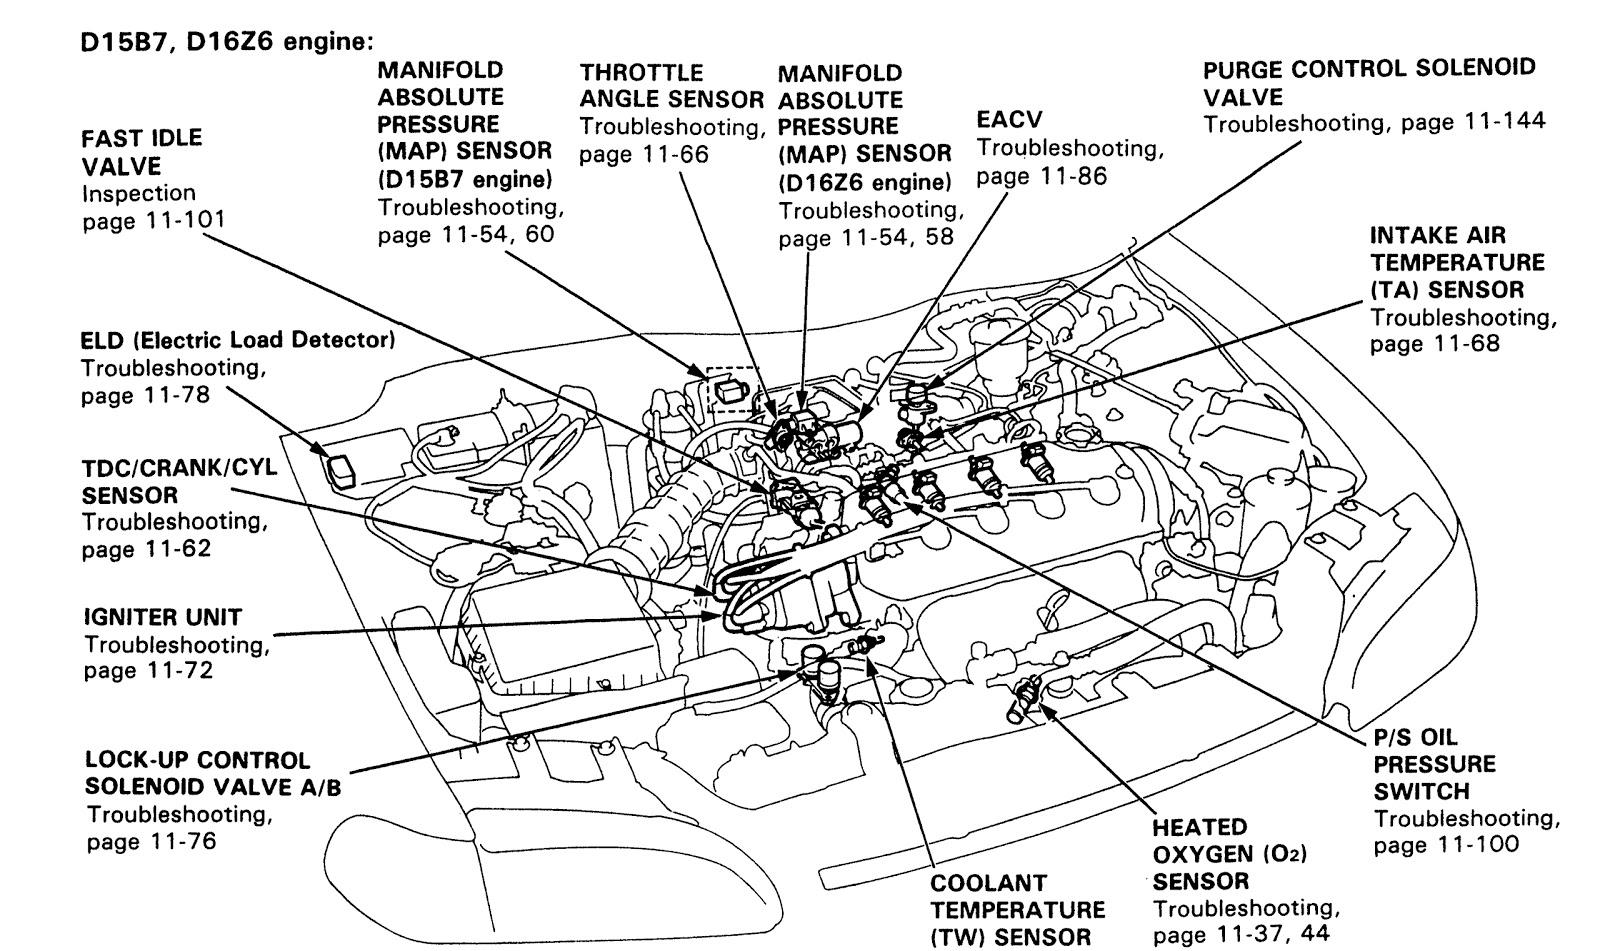 Gsr map sensor wiring diagram also s honda tech forums attachments acura integra 6 451432d1501528094 2000 gsr map tps